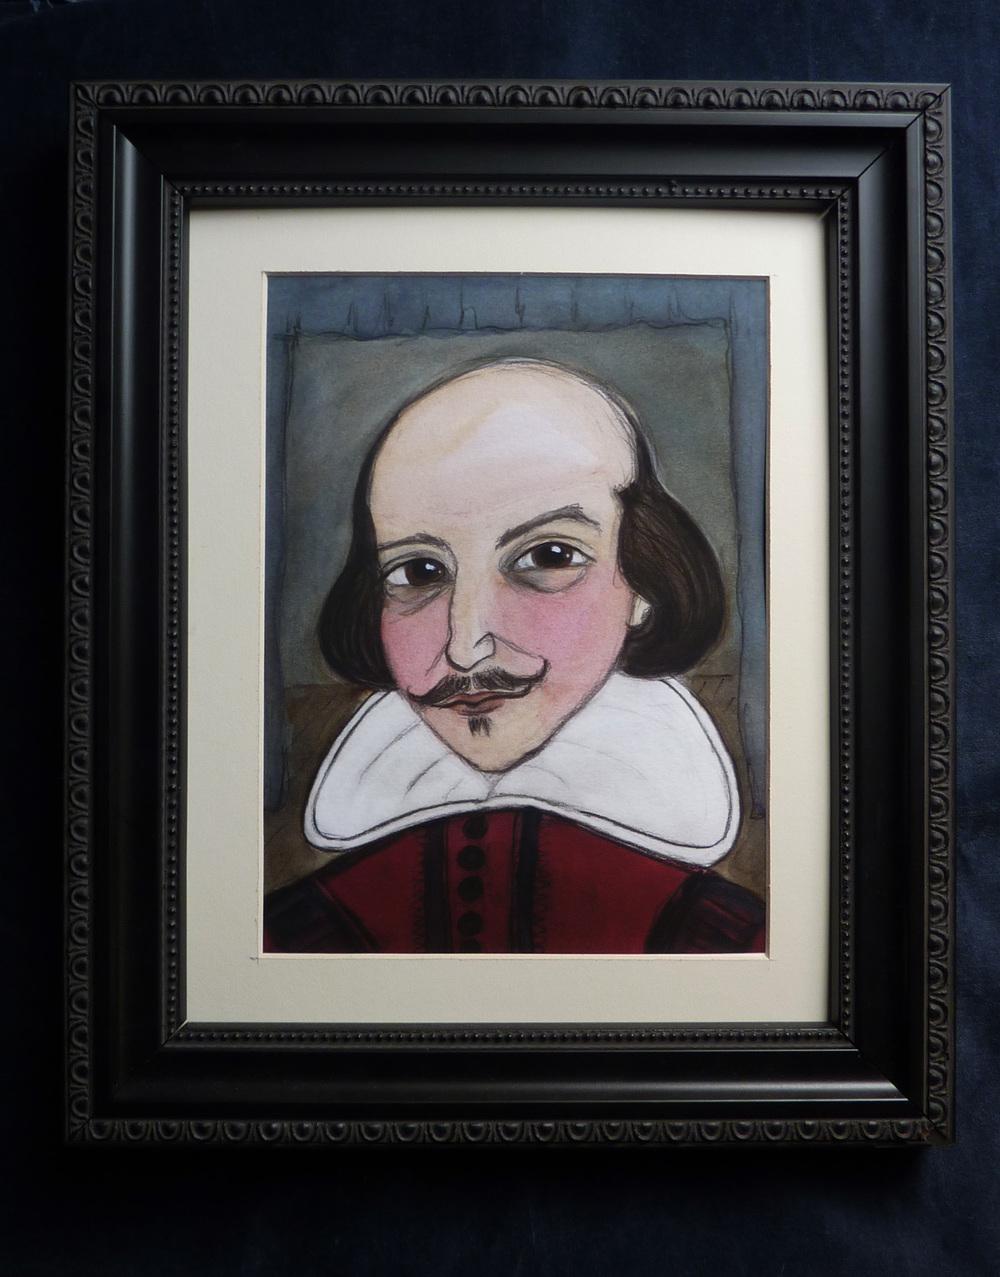 William Shakespeare Literary Portrait